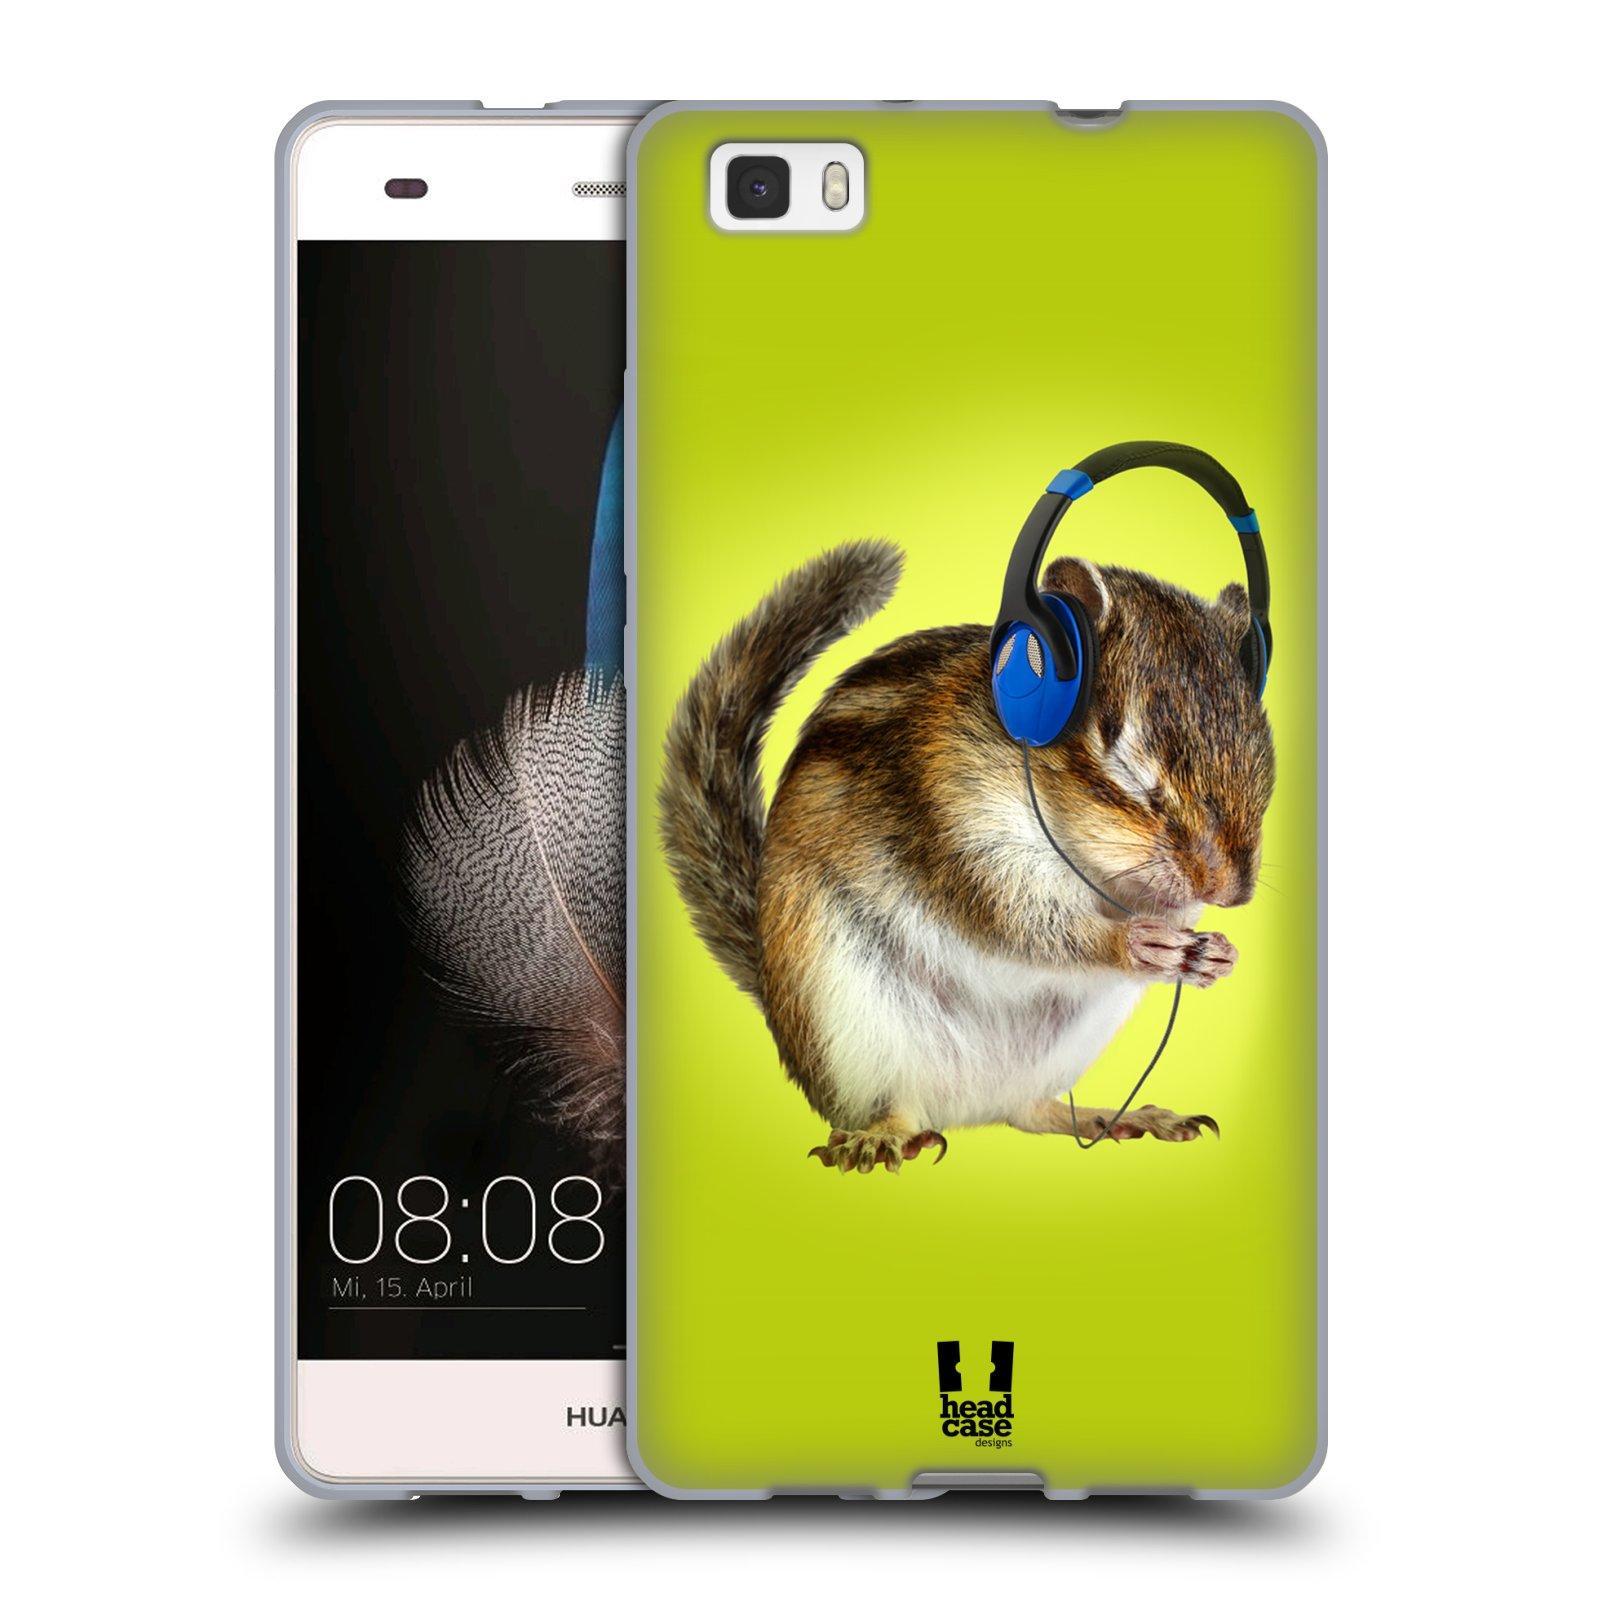 HEAD CASE silikonový obal na mobil Huawei  P8 LITE Legrační zvířátka Veverka DJ